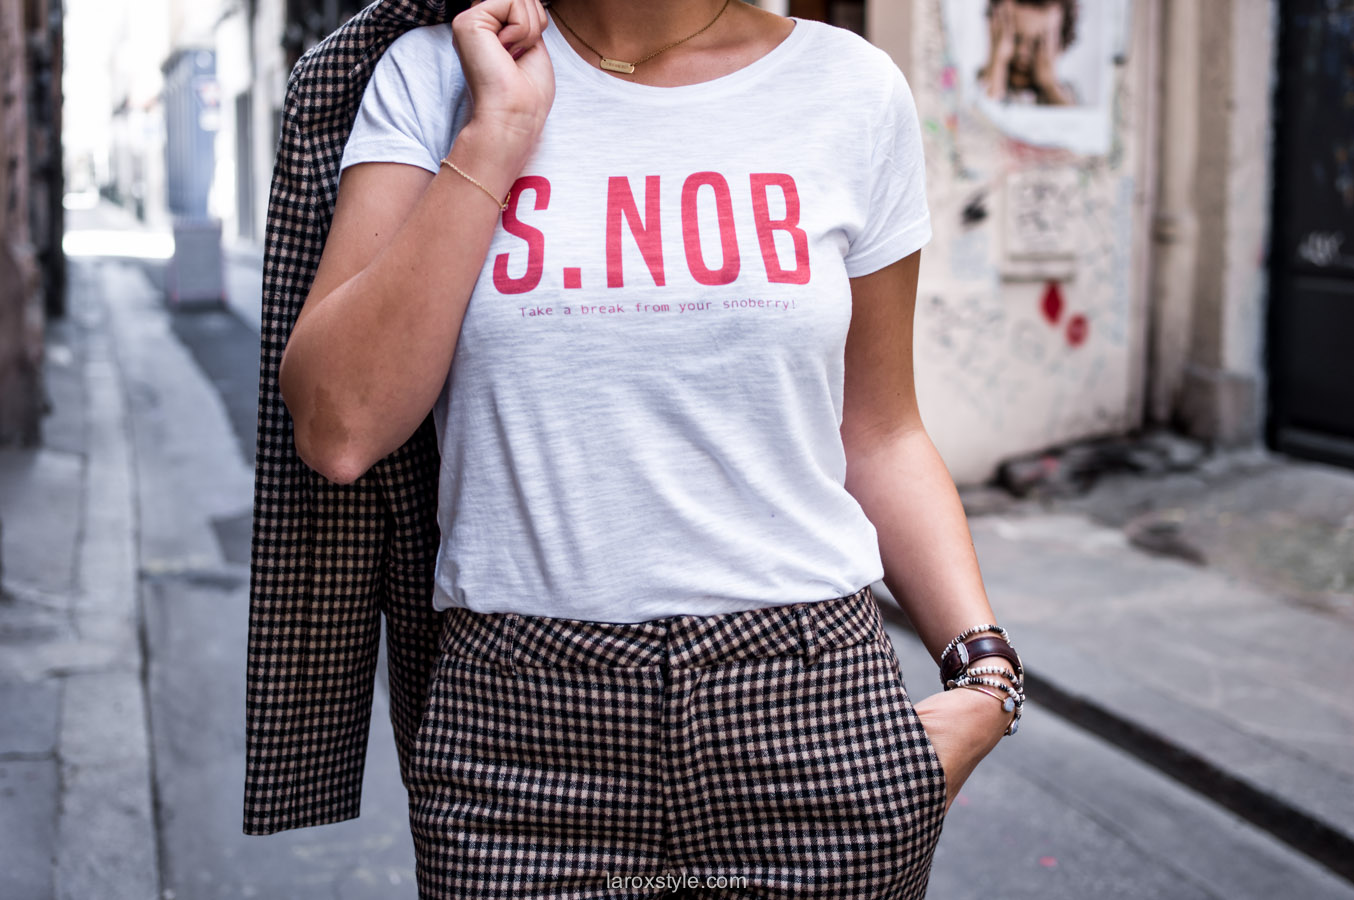 costume femme - tendance costume - t shirt message leonor roversi - SNOB - laroxstyle-10